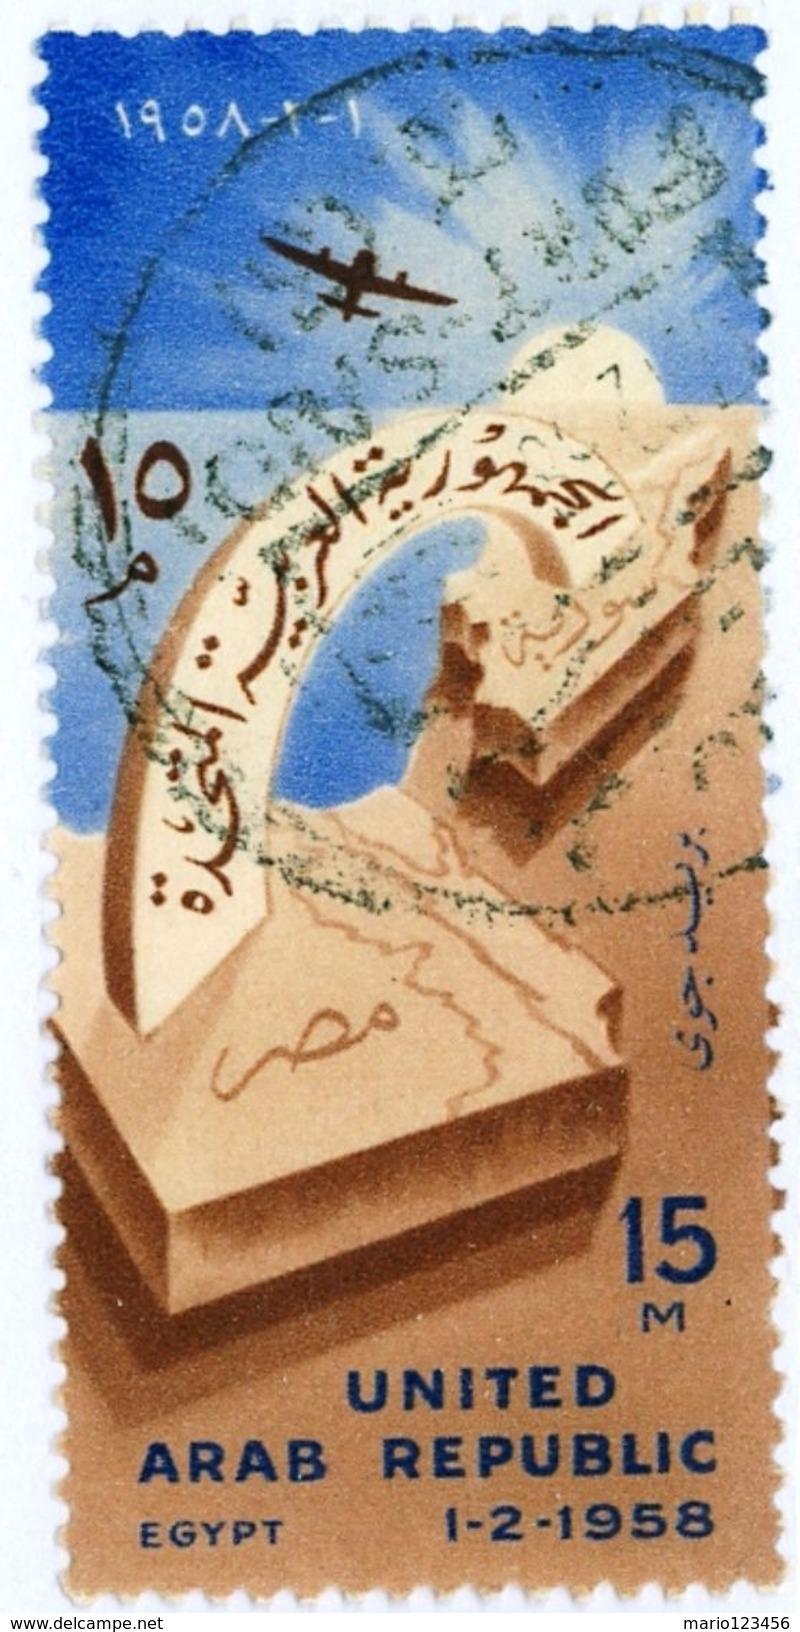 EGITTO, EGYPT, REPUBBLICA ARABA UNITA, POSTA AEREA, AIRMAIL, 1958, FRANCOBOLLI USATI Yvert Tellier PA80   Scott C90 - Posta Aerea